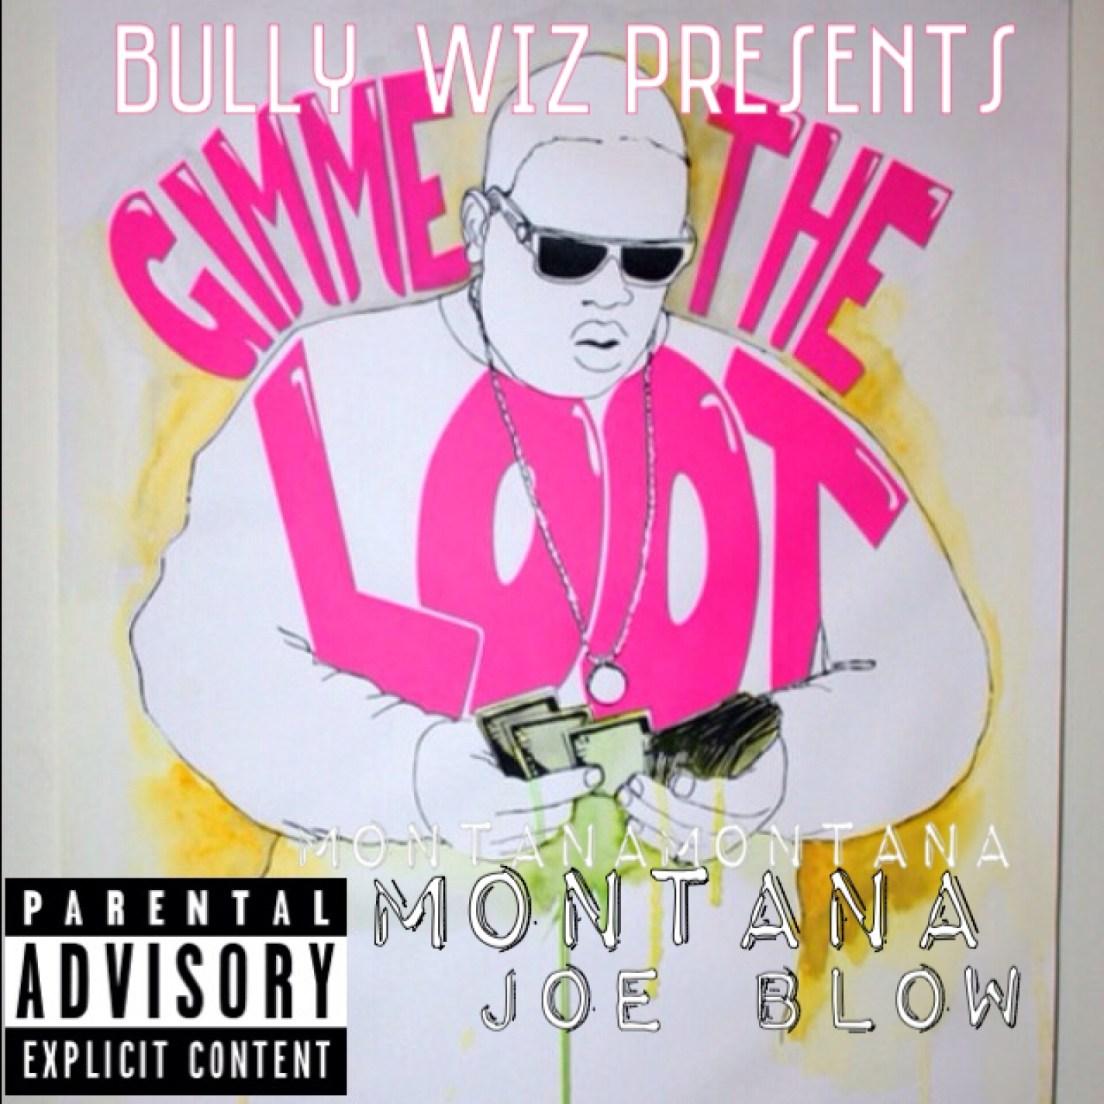 Bully Wiz Presents Montana Montana Montana x Joe Blow - Gimme The Loot [Thizzler.com Exclusive]